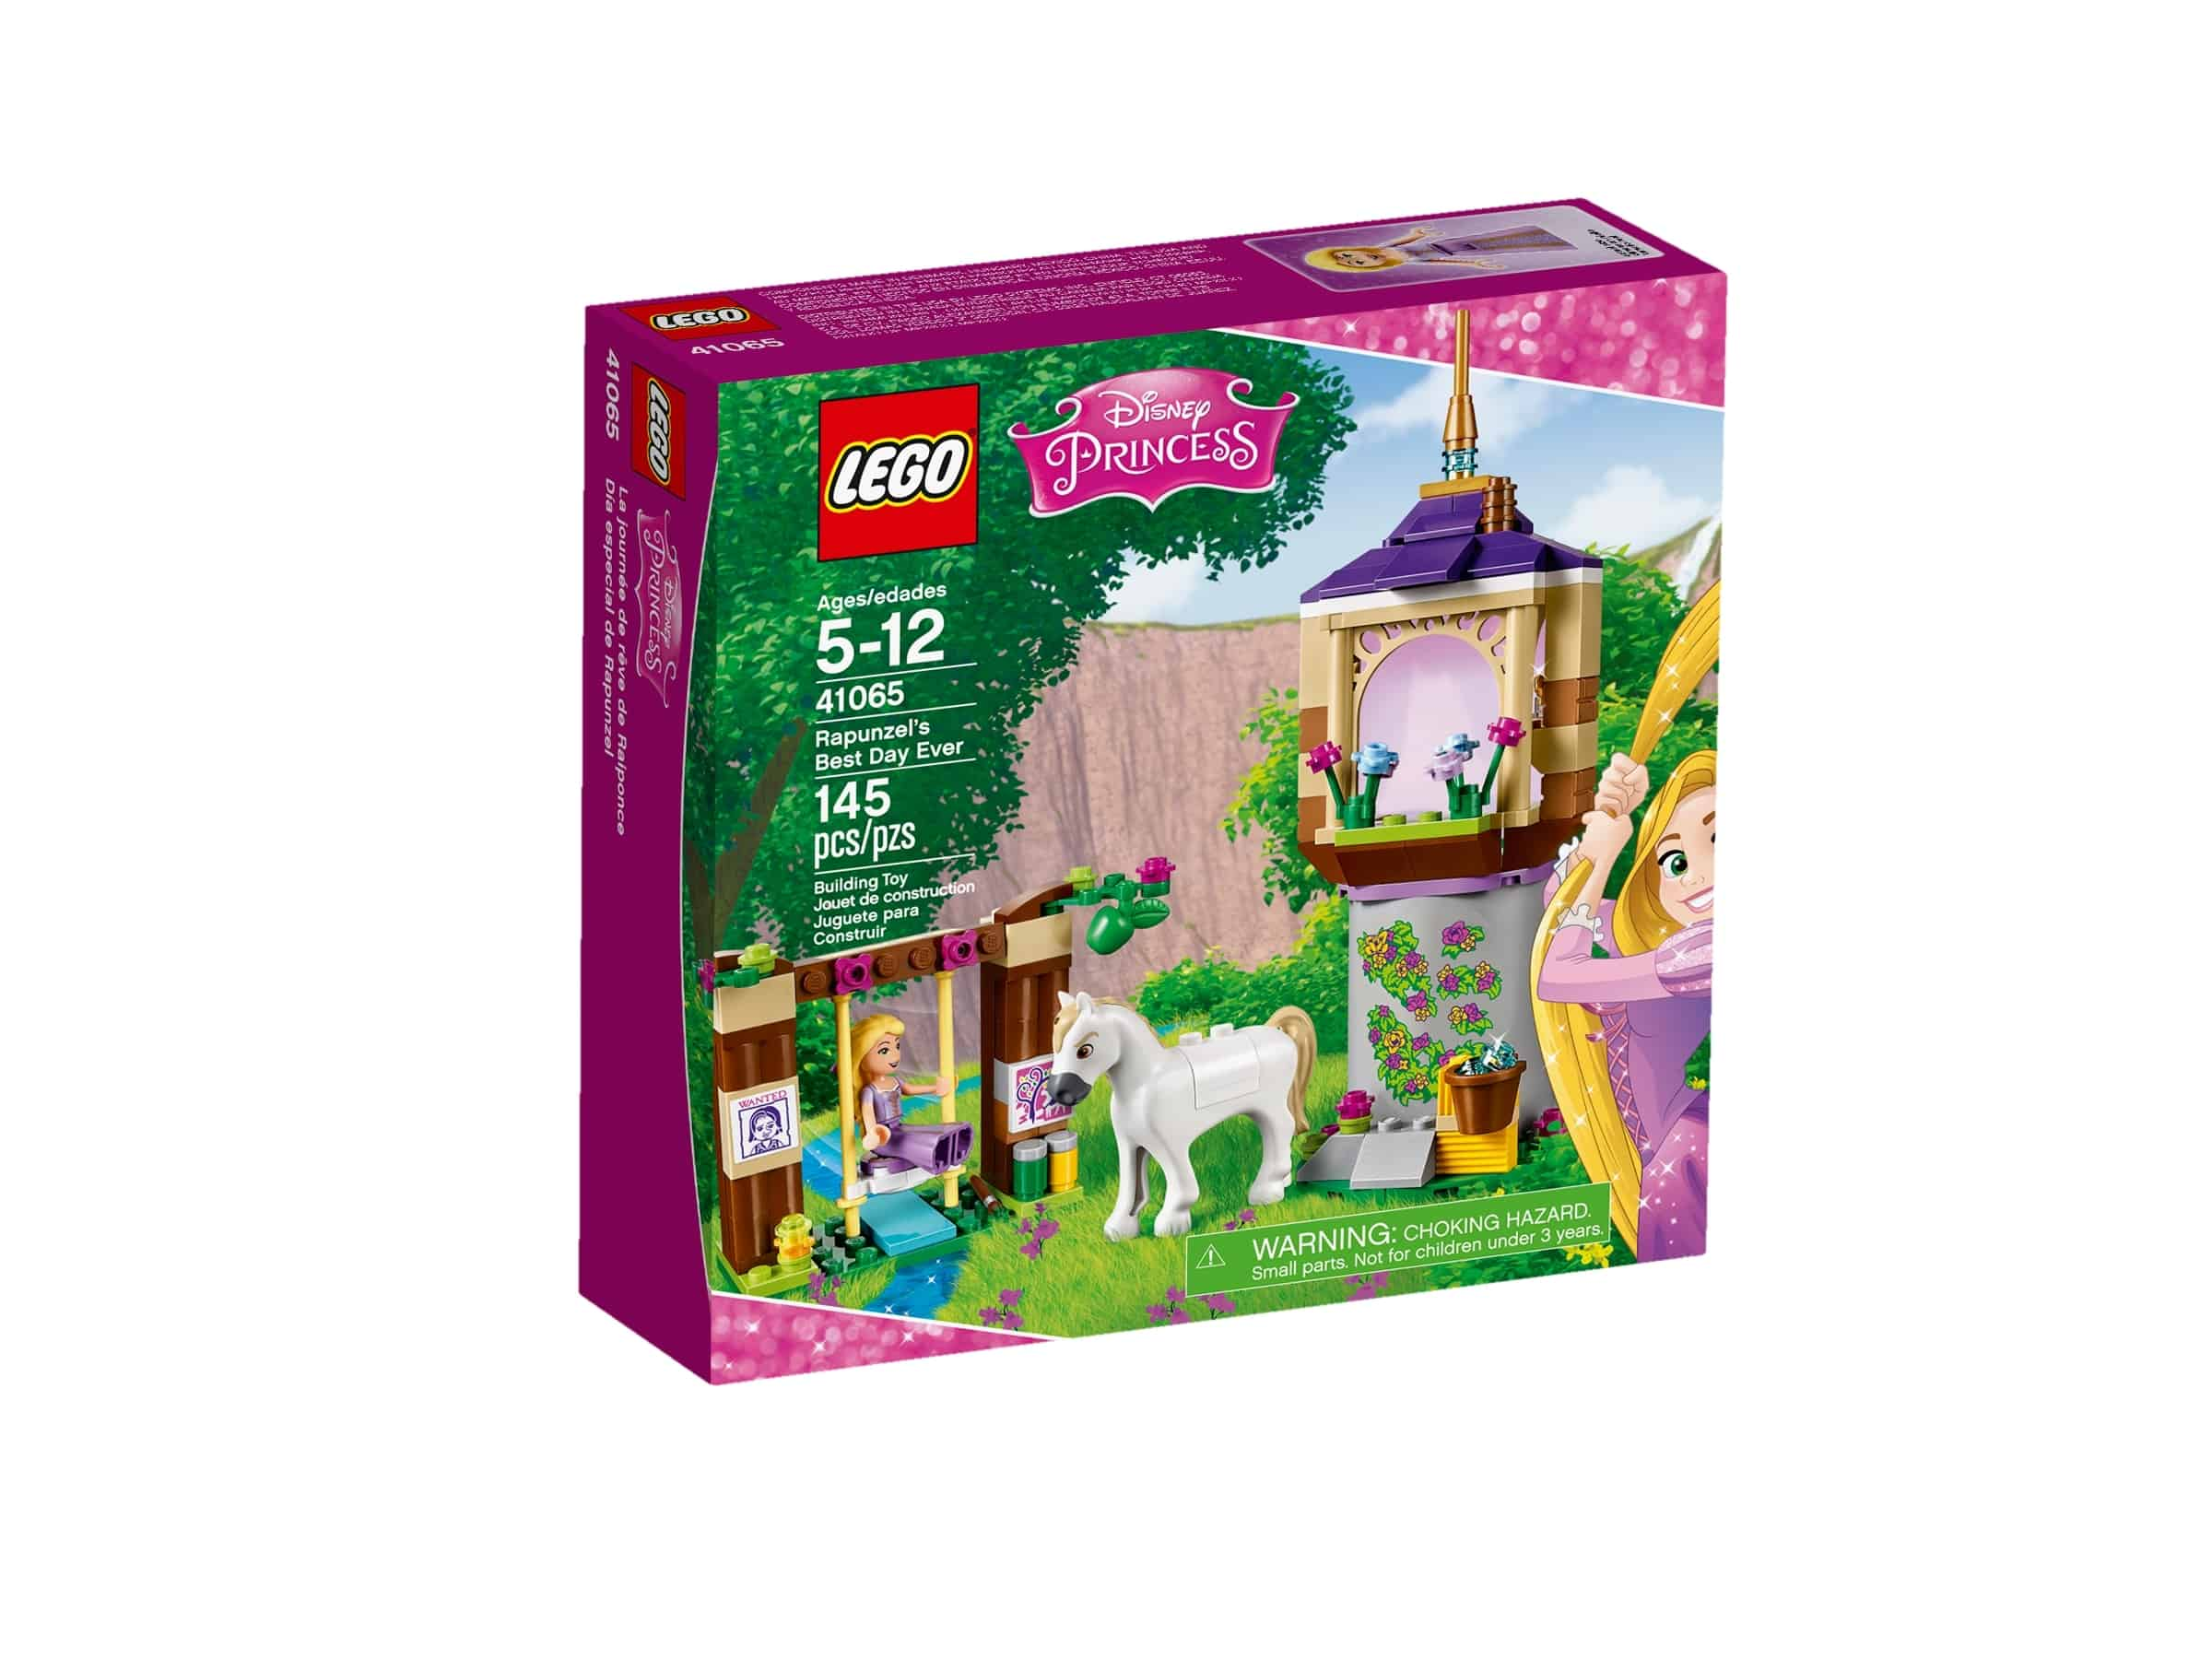 lego 41065 rapunsels beste dag